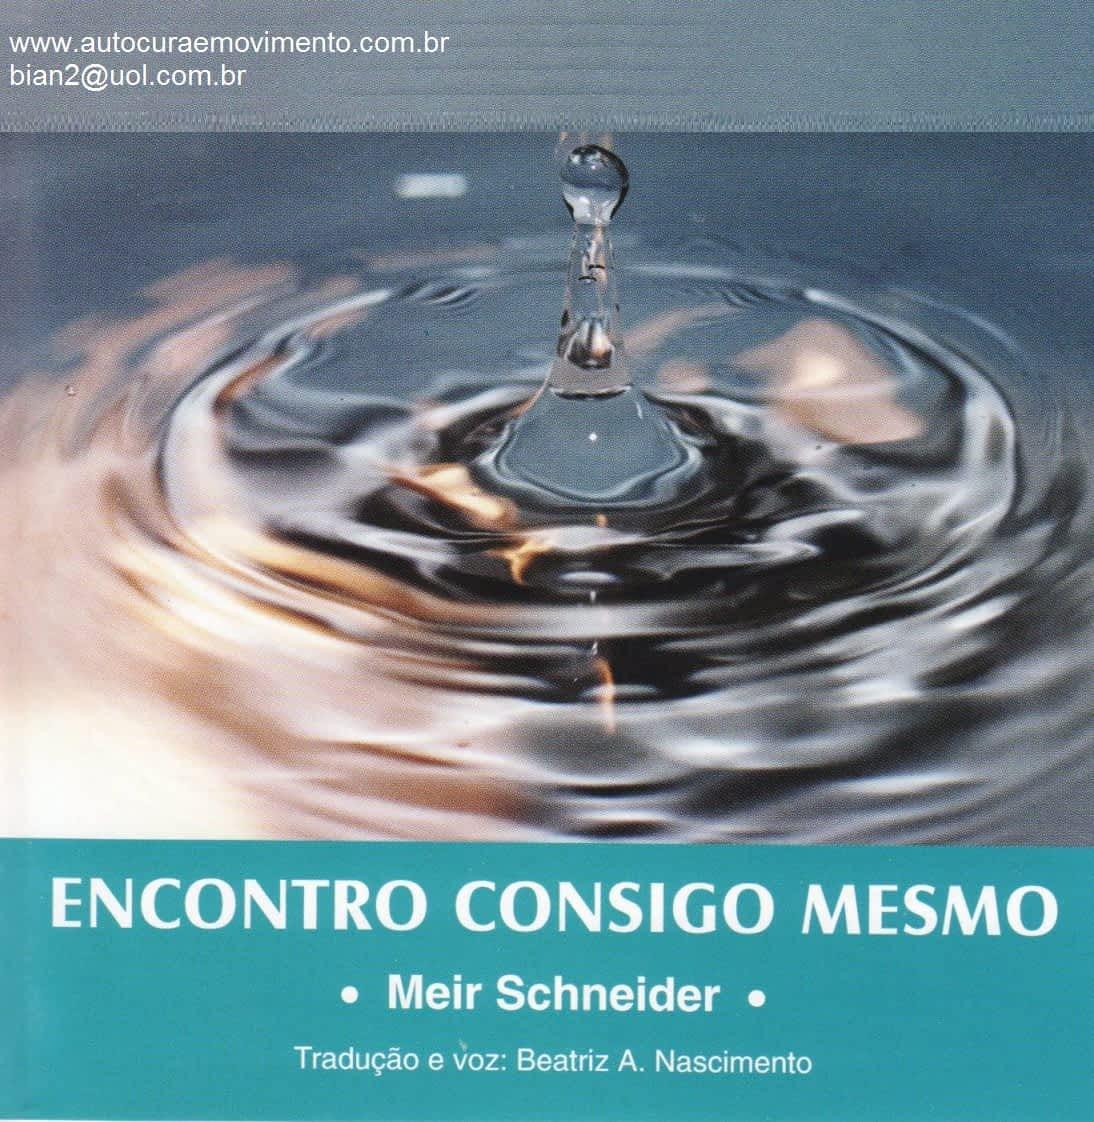 ENCONTRO CONSIGO MESMO